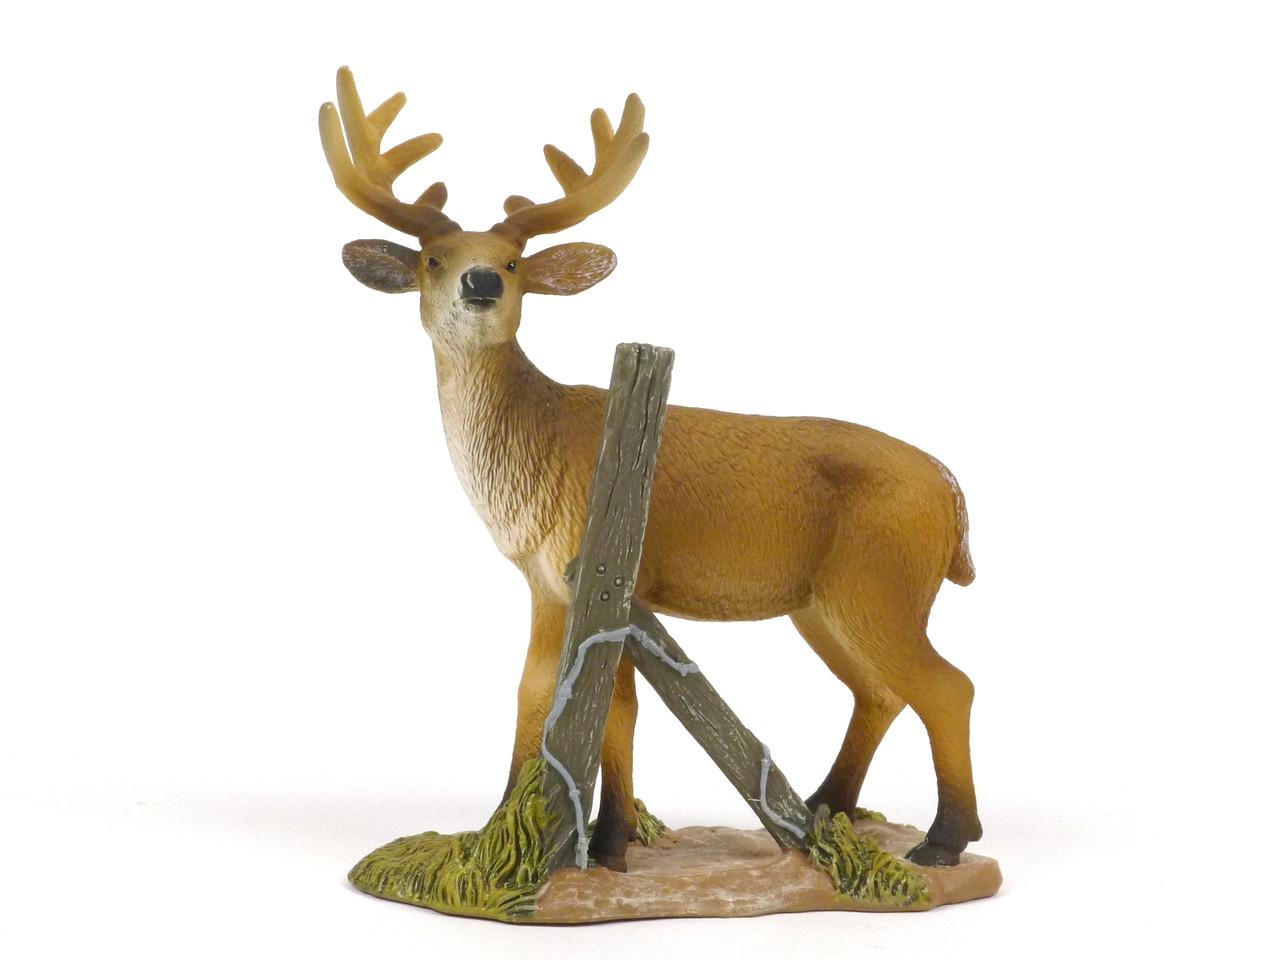 Wildlife Figurine By Royal Darwin Black Bear Collectible Animal Figure 100